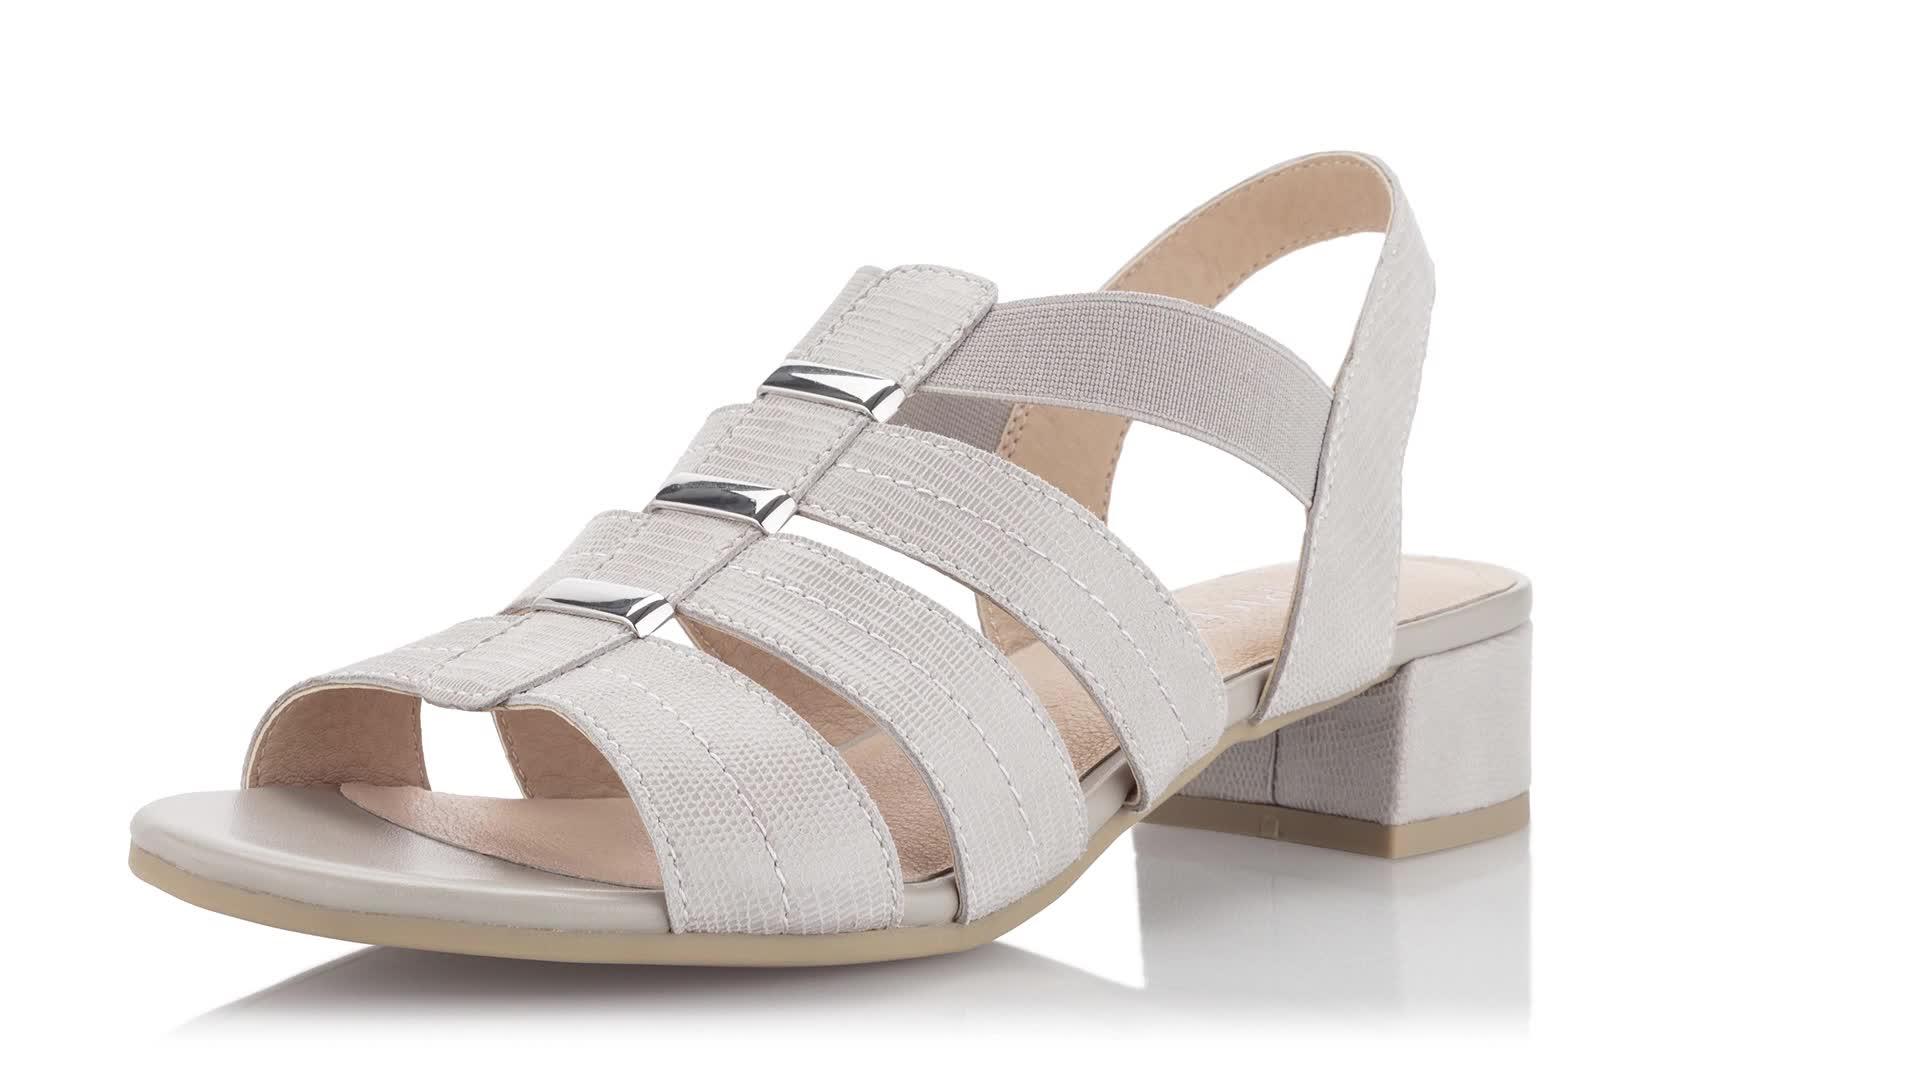 Caprice Sandalette aus Glanzleder